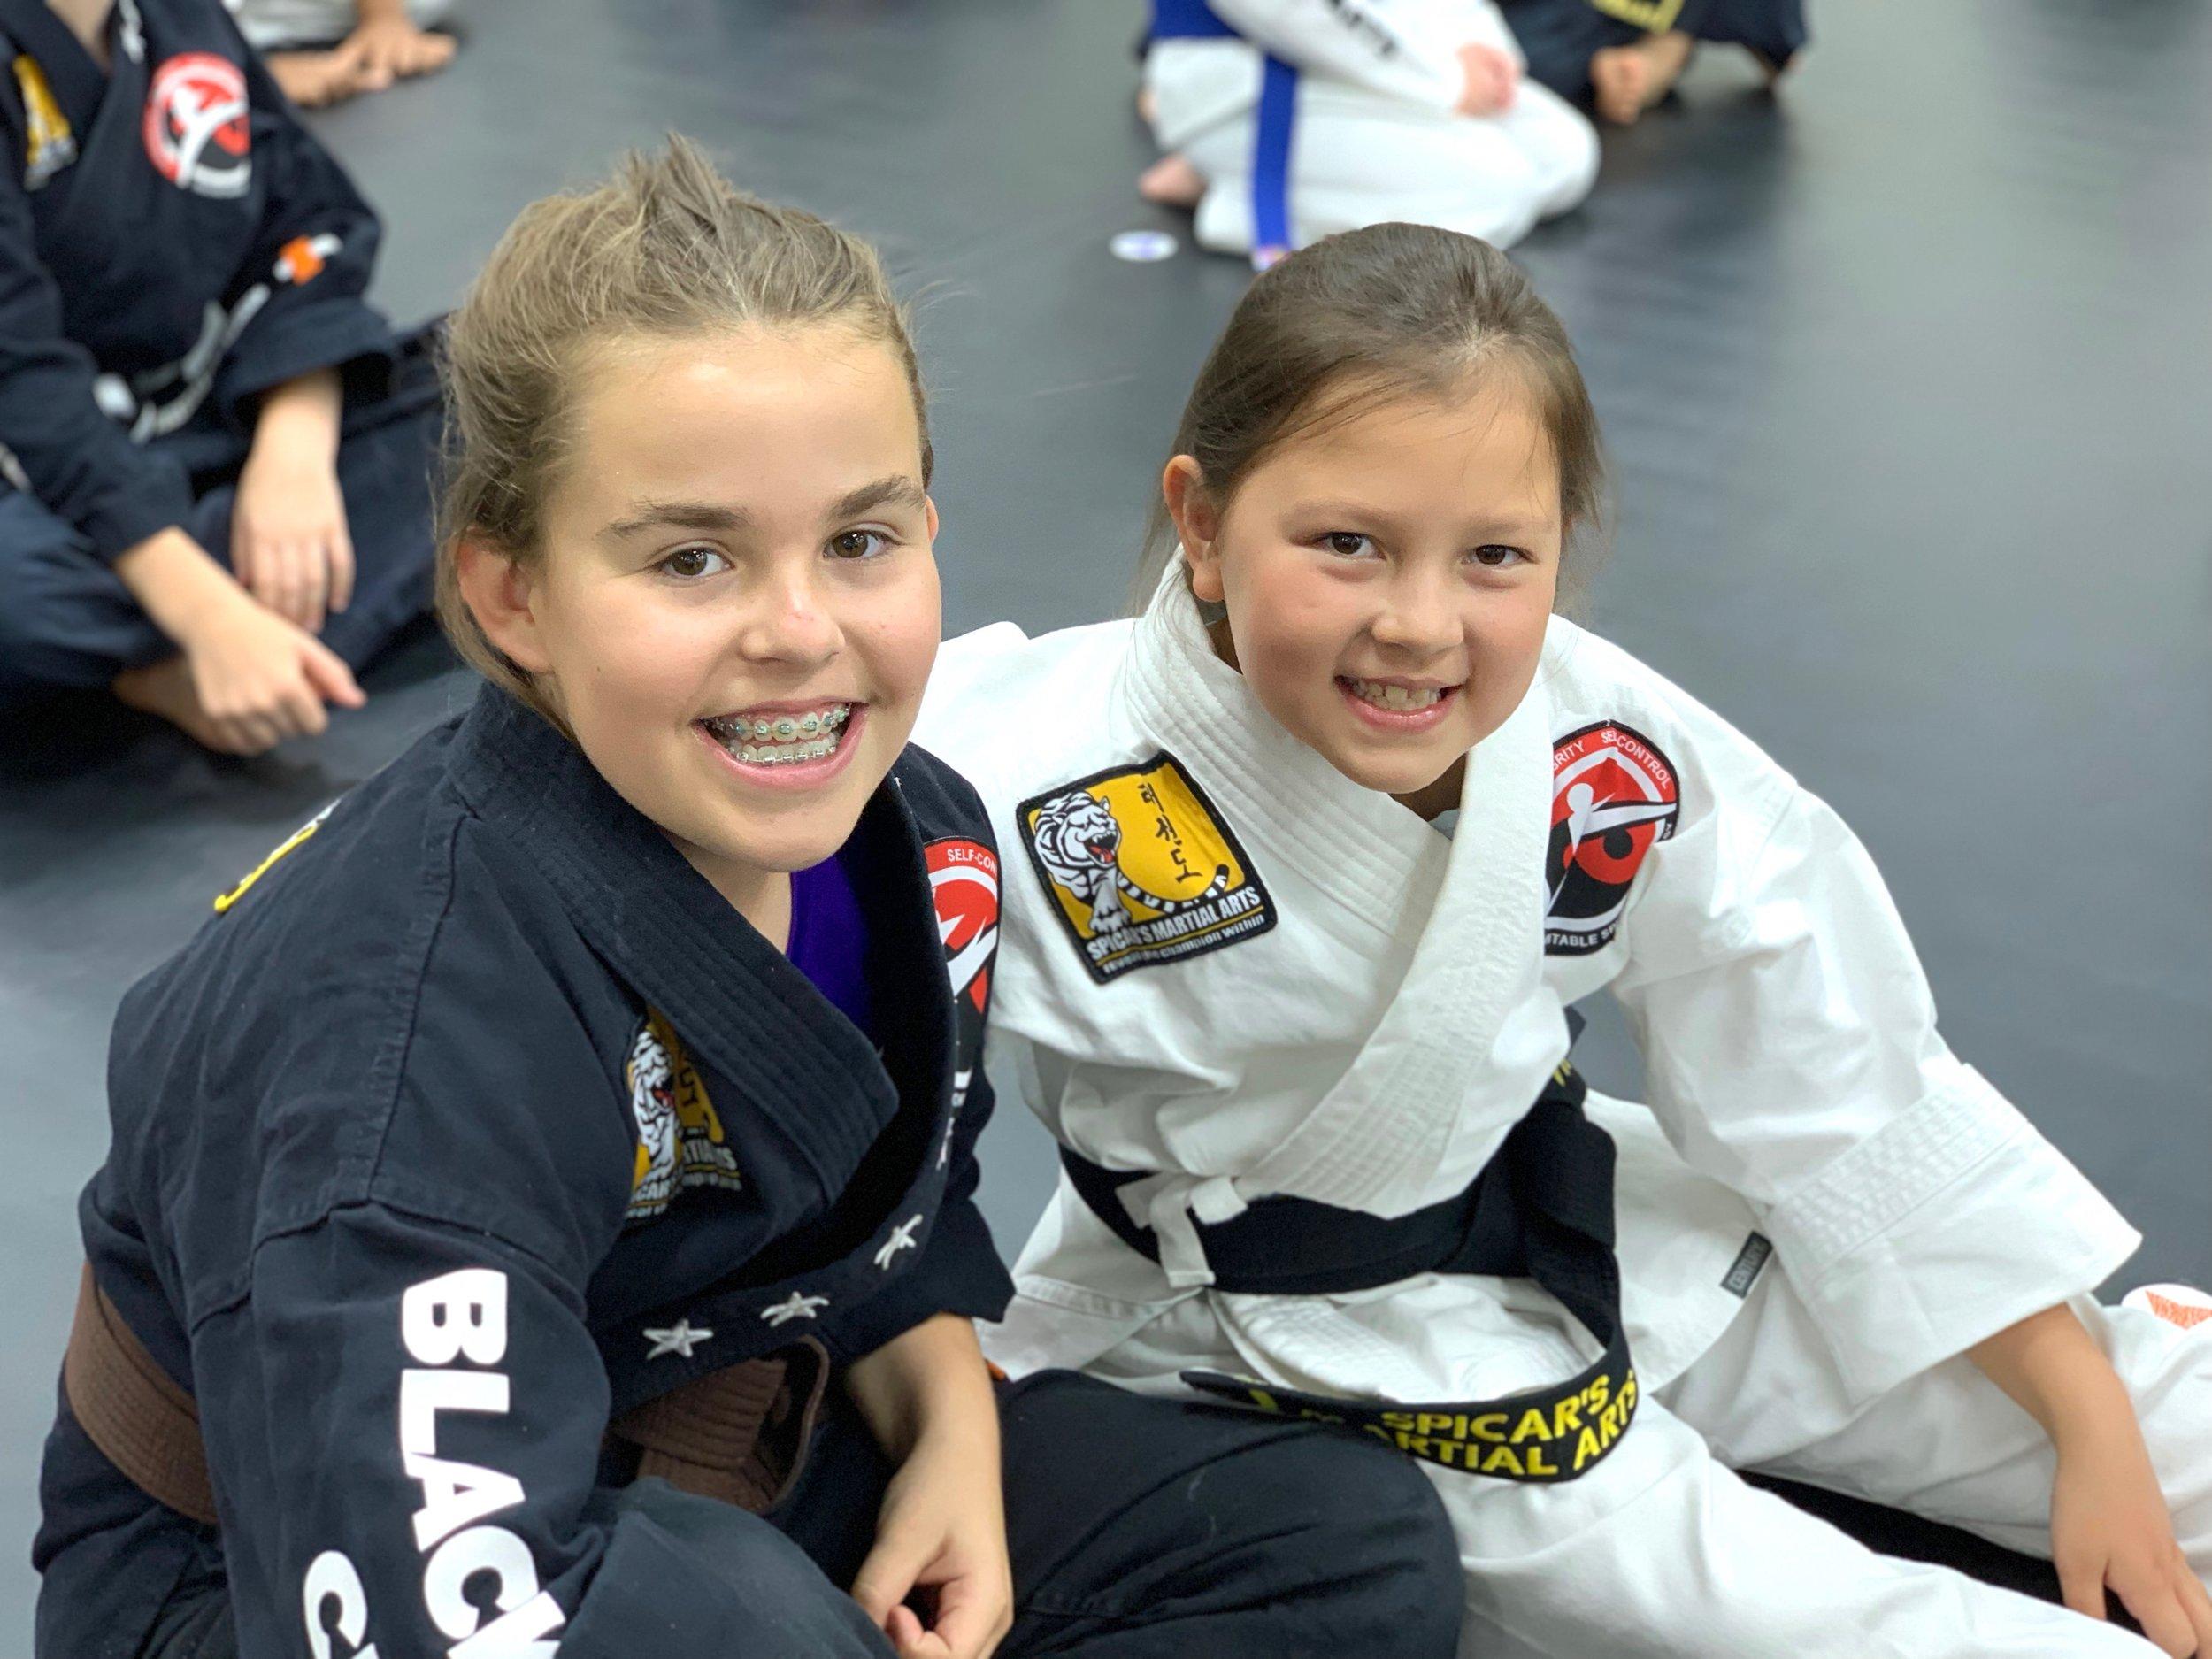 karate-kids-program-souhtlake-keller-grapevine-texas00021.jpeg